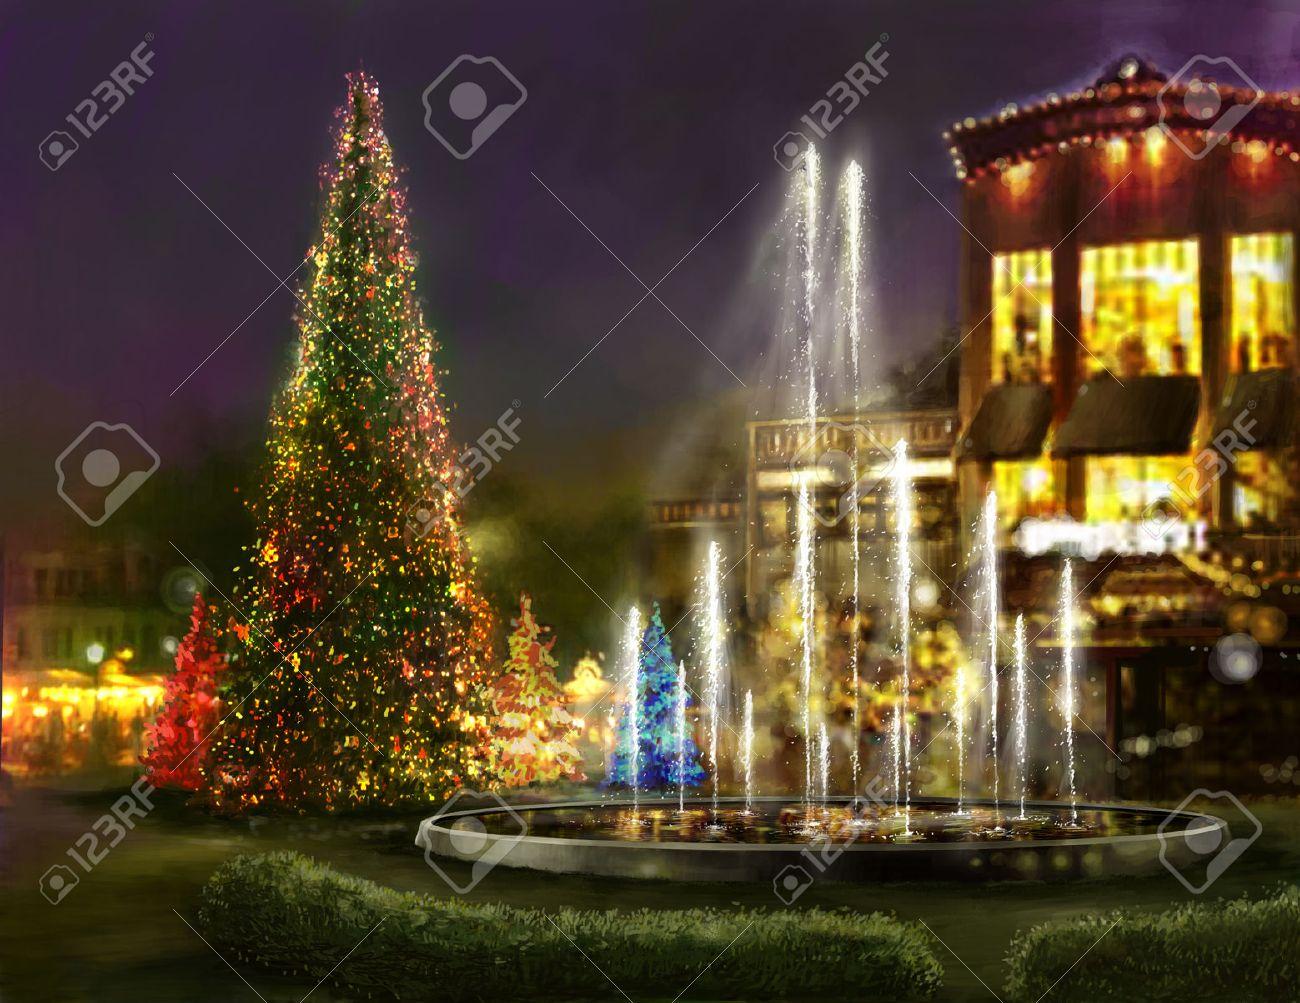 Christmas shopping, black friday,romantic place for dinner - 22759970